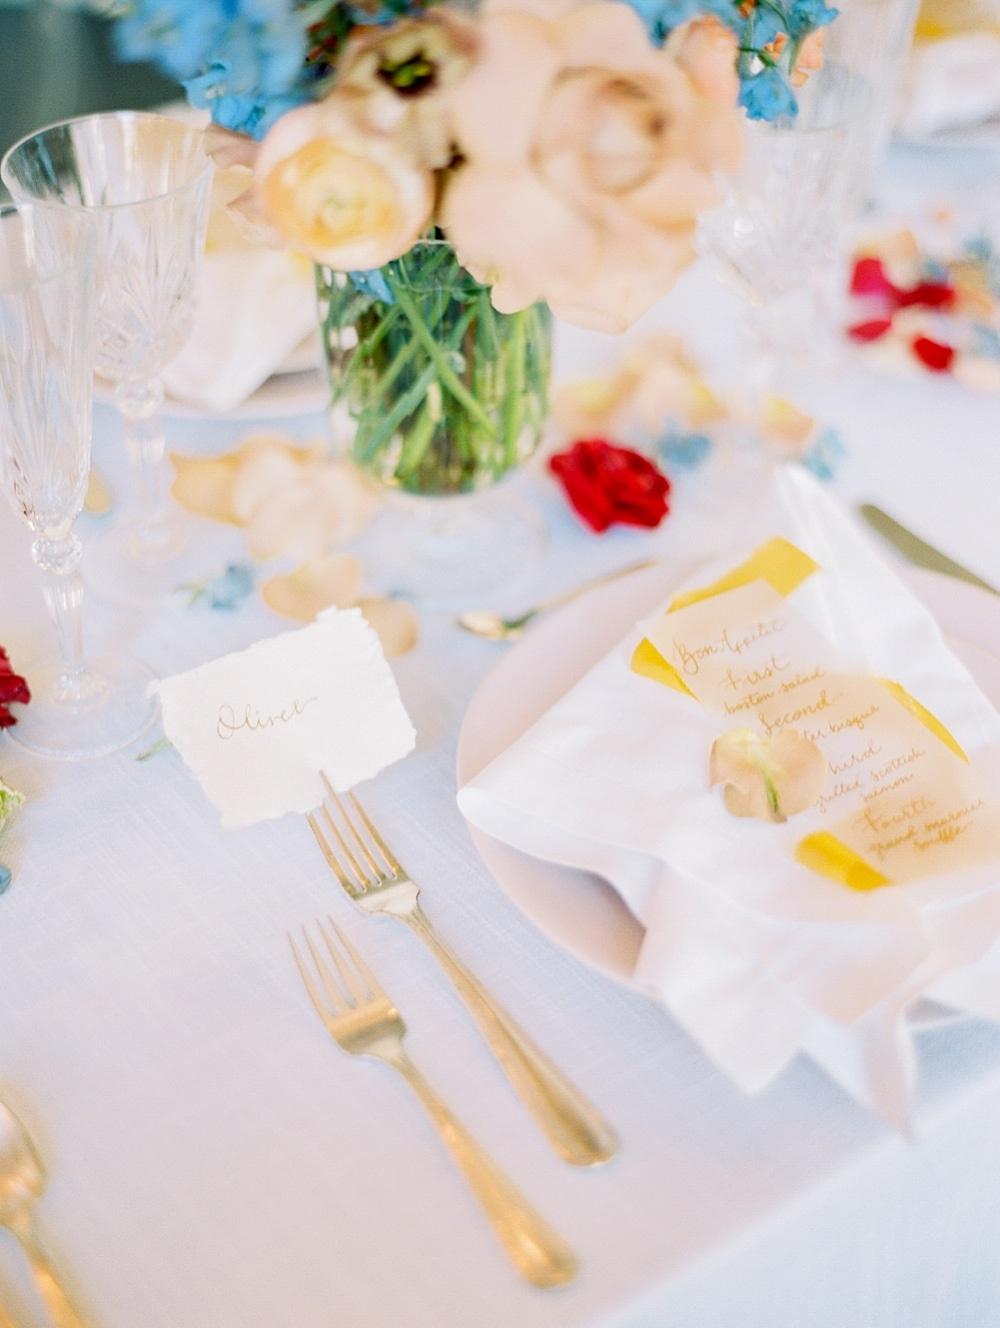 kristin-la-voie-photography-austin-wedding-photographer-woodbine-mansion-11